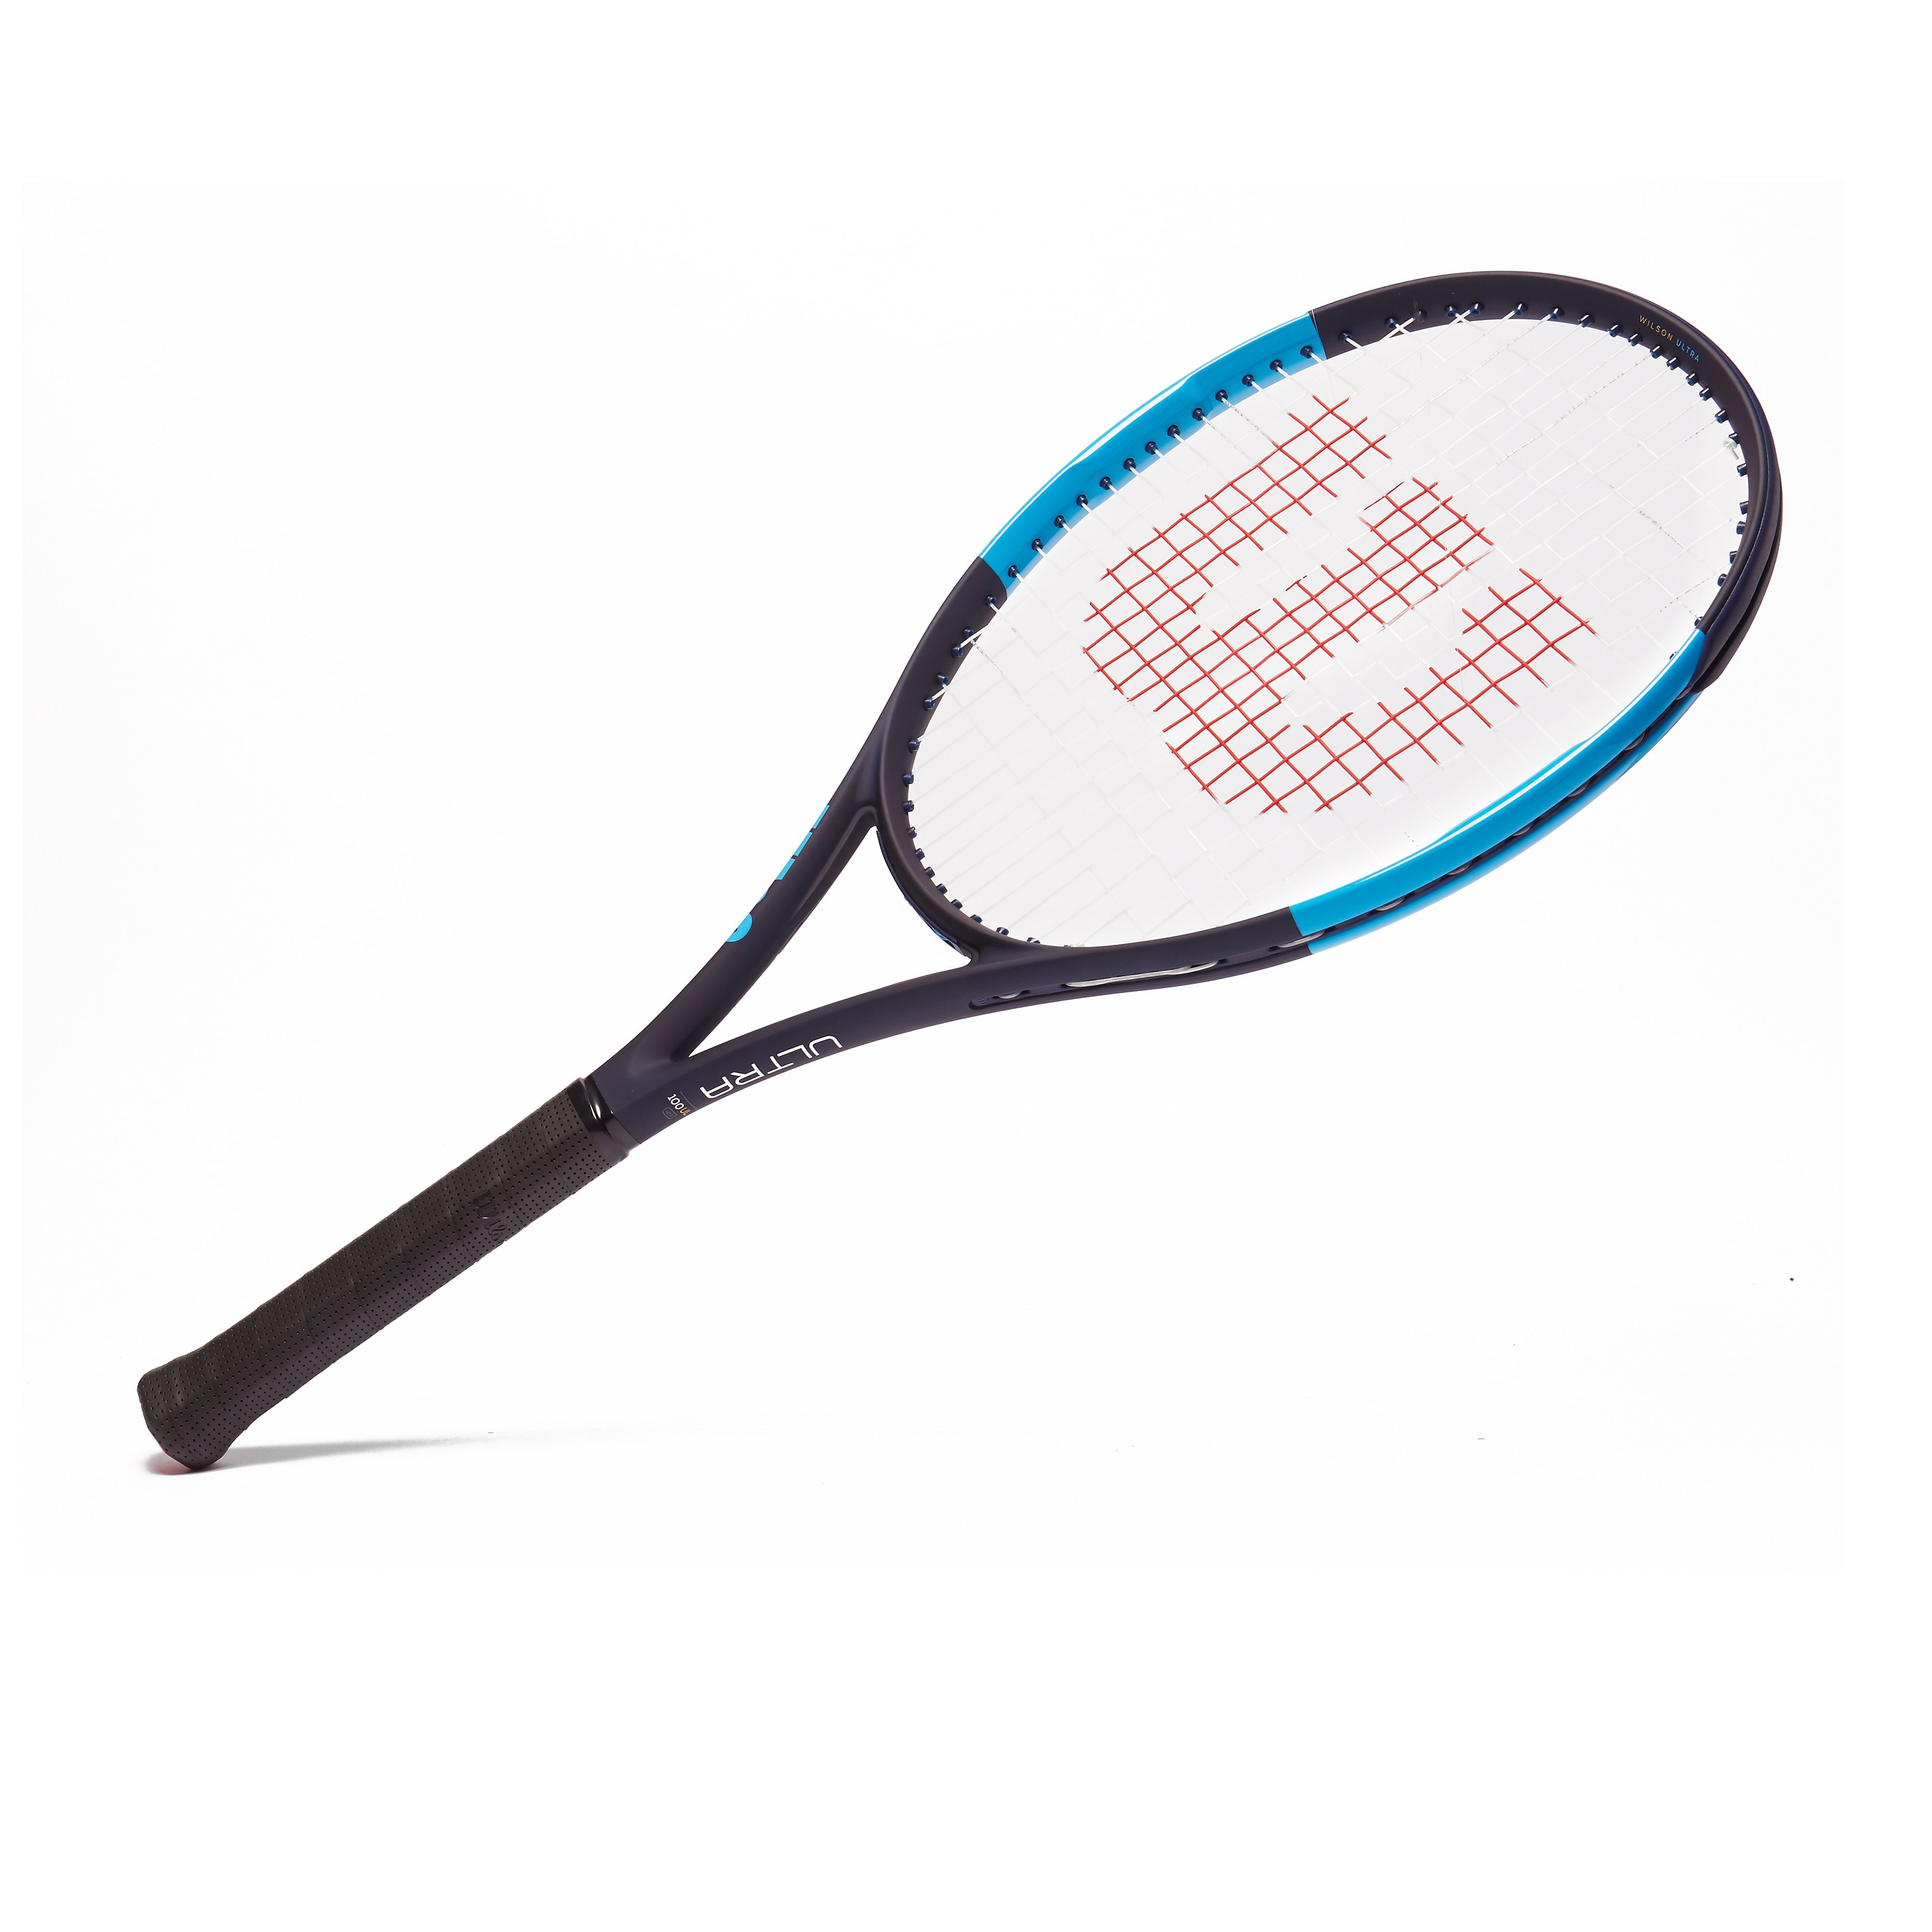 Blue Wilson Ultra 100UL Tennis Racket